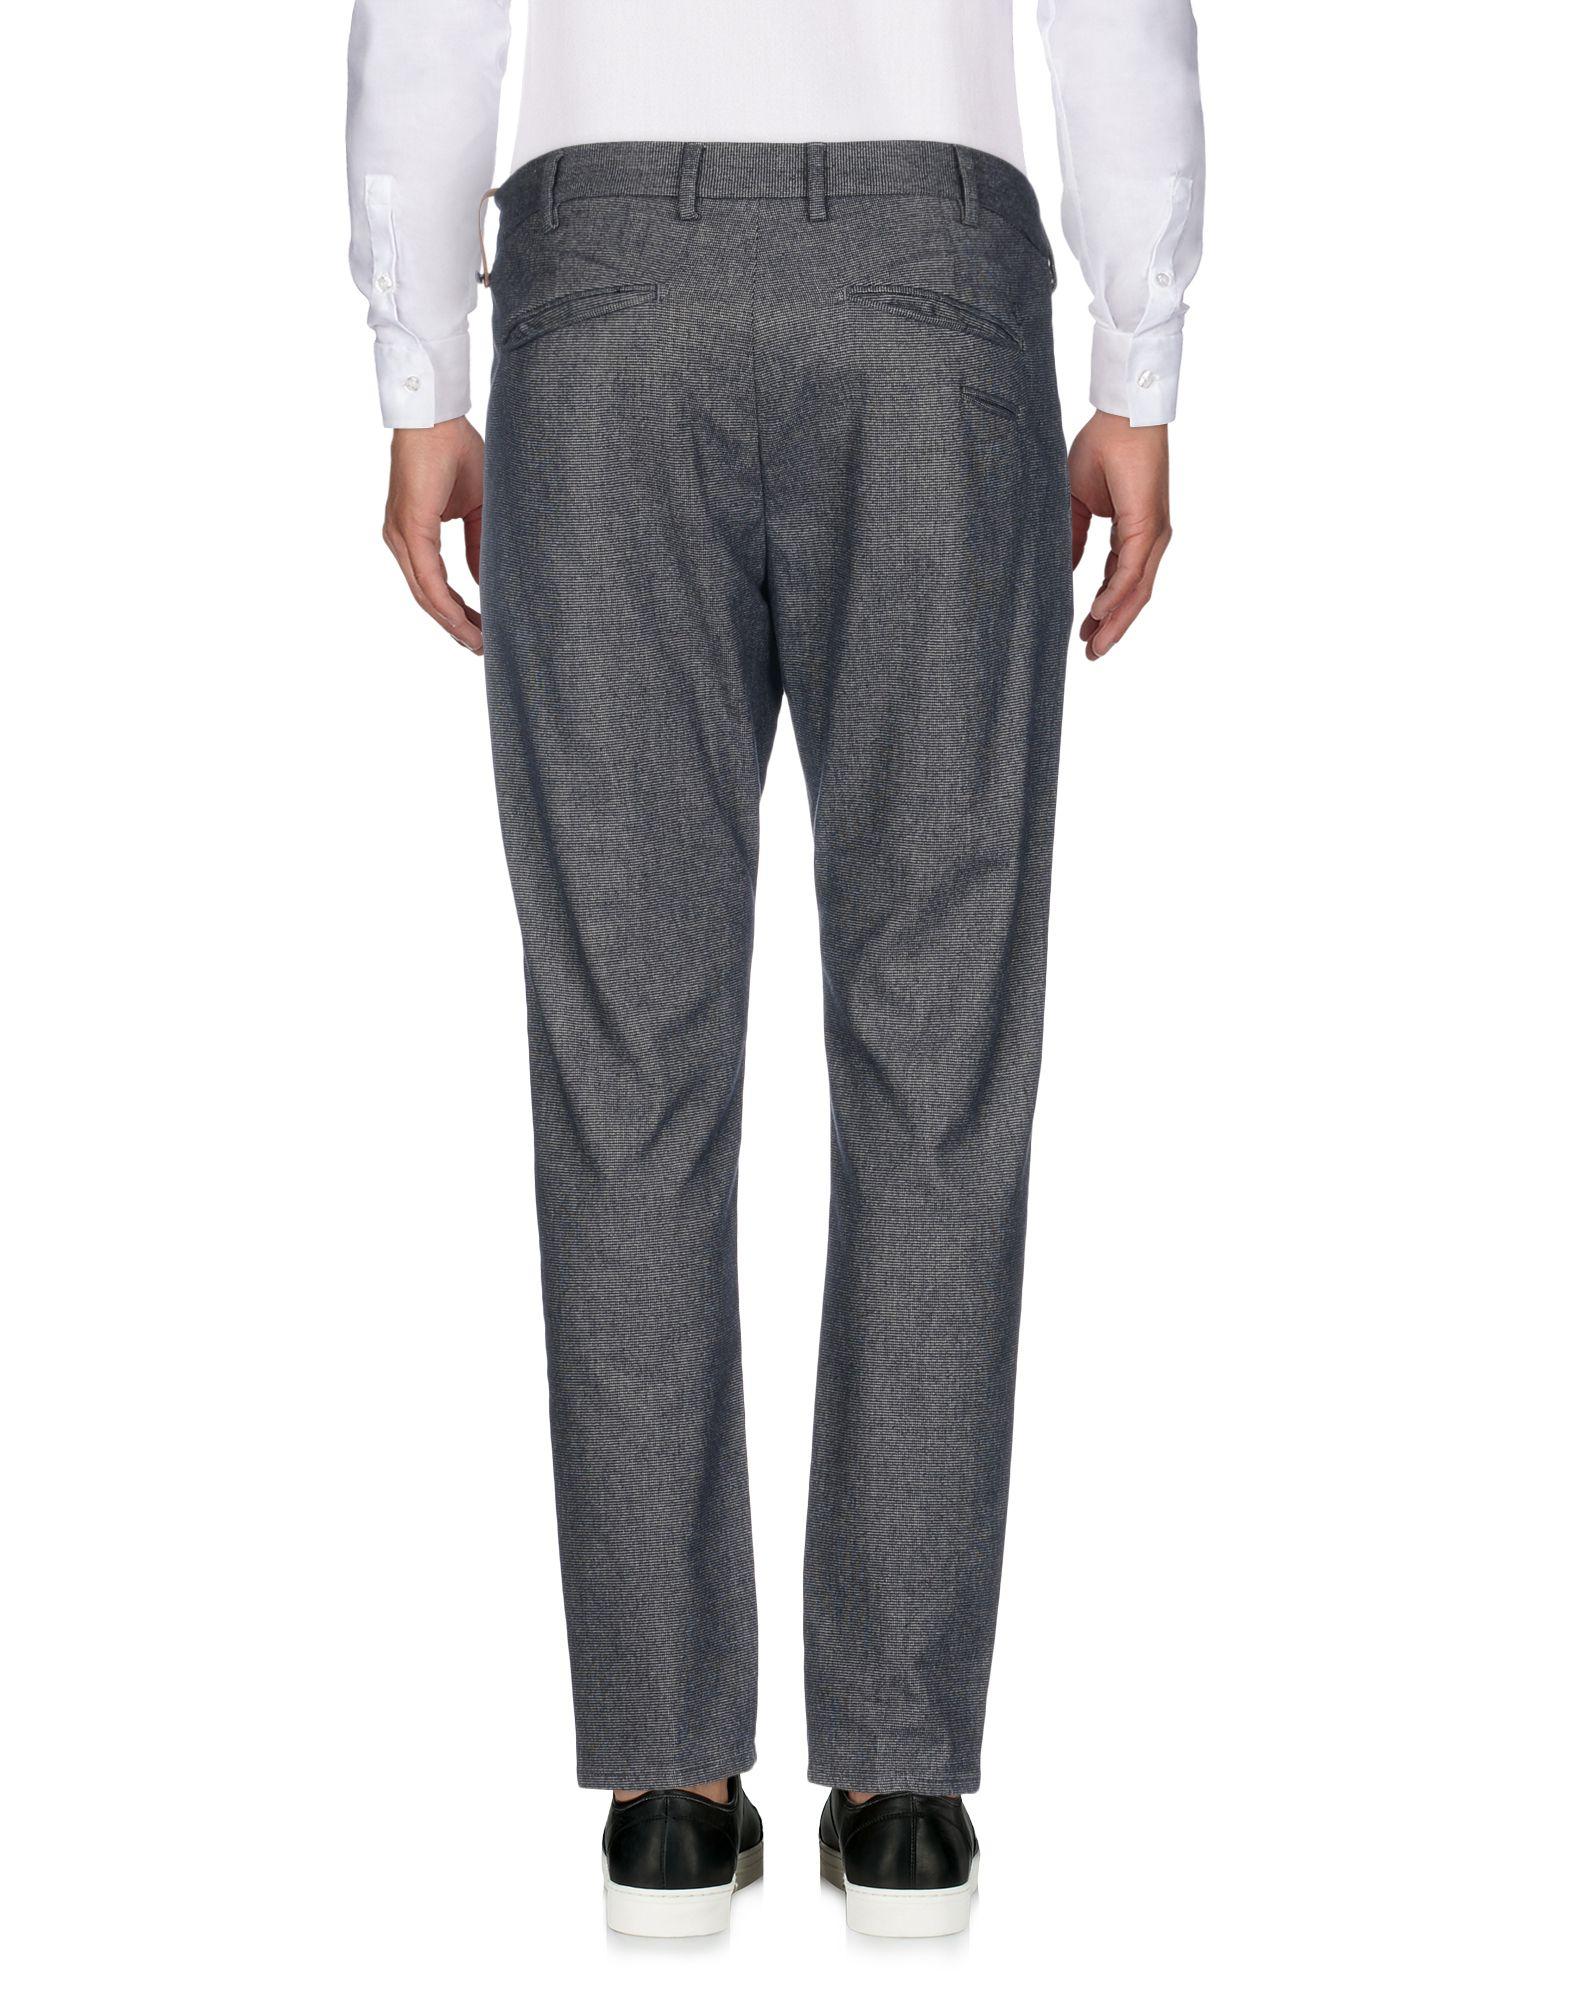 Pantalone At.P.Co Uomo Uomo Uomo - 13198618MC 5d644f